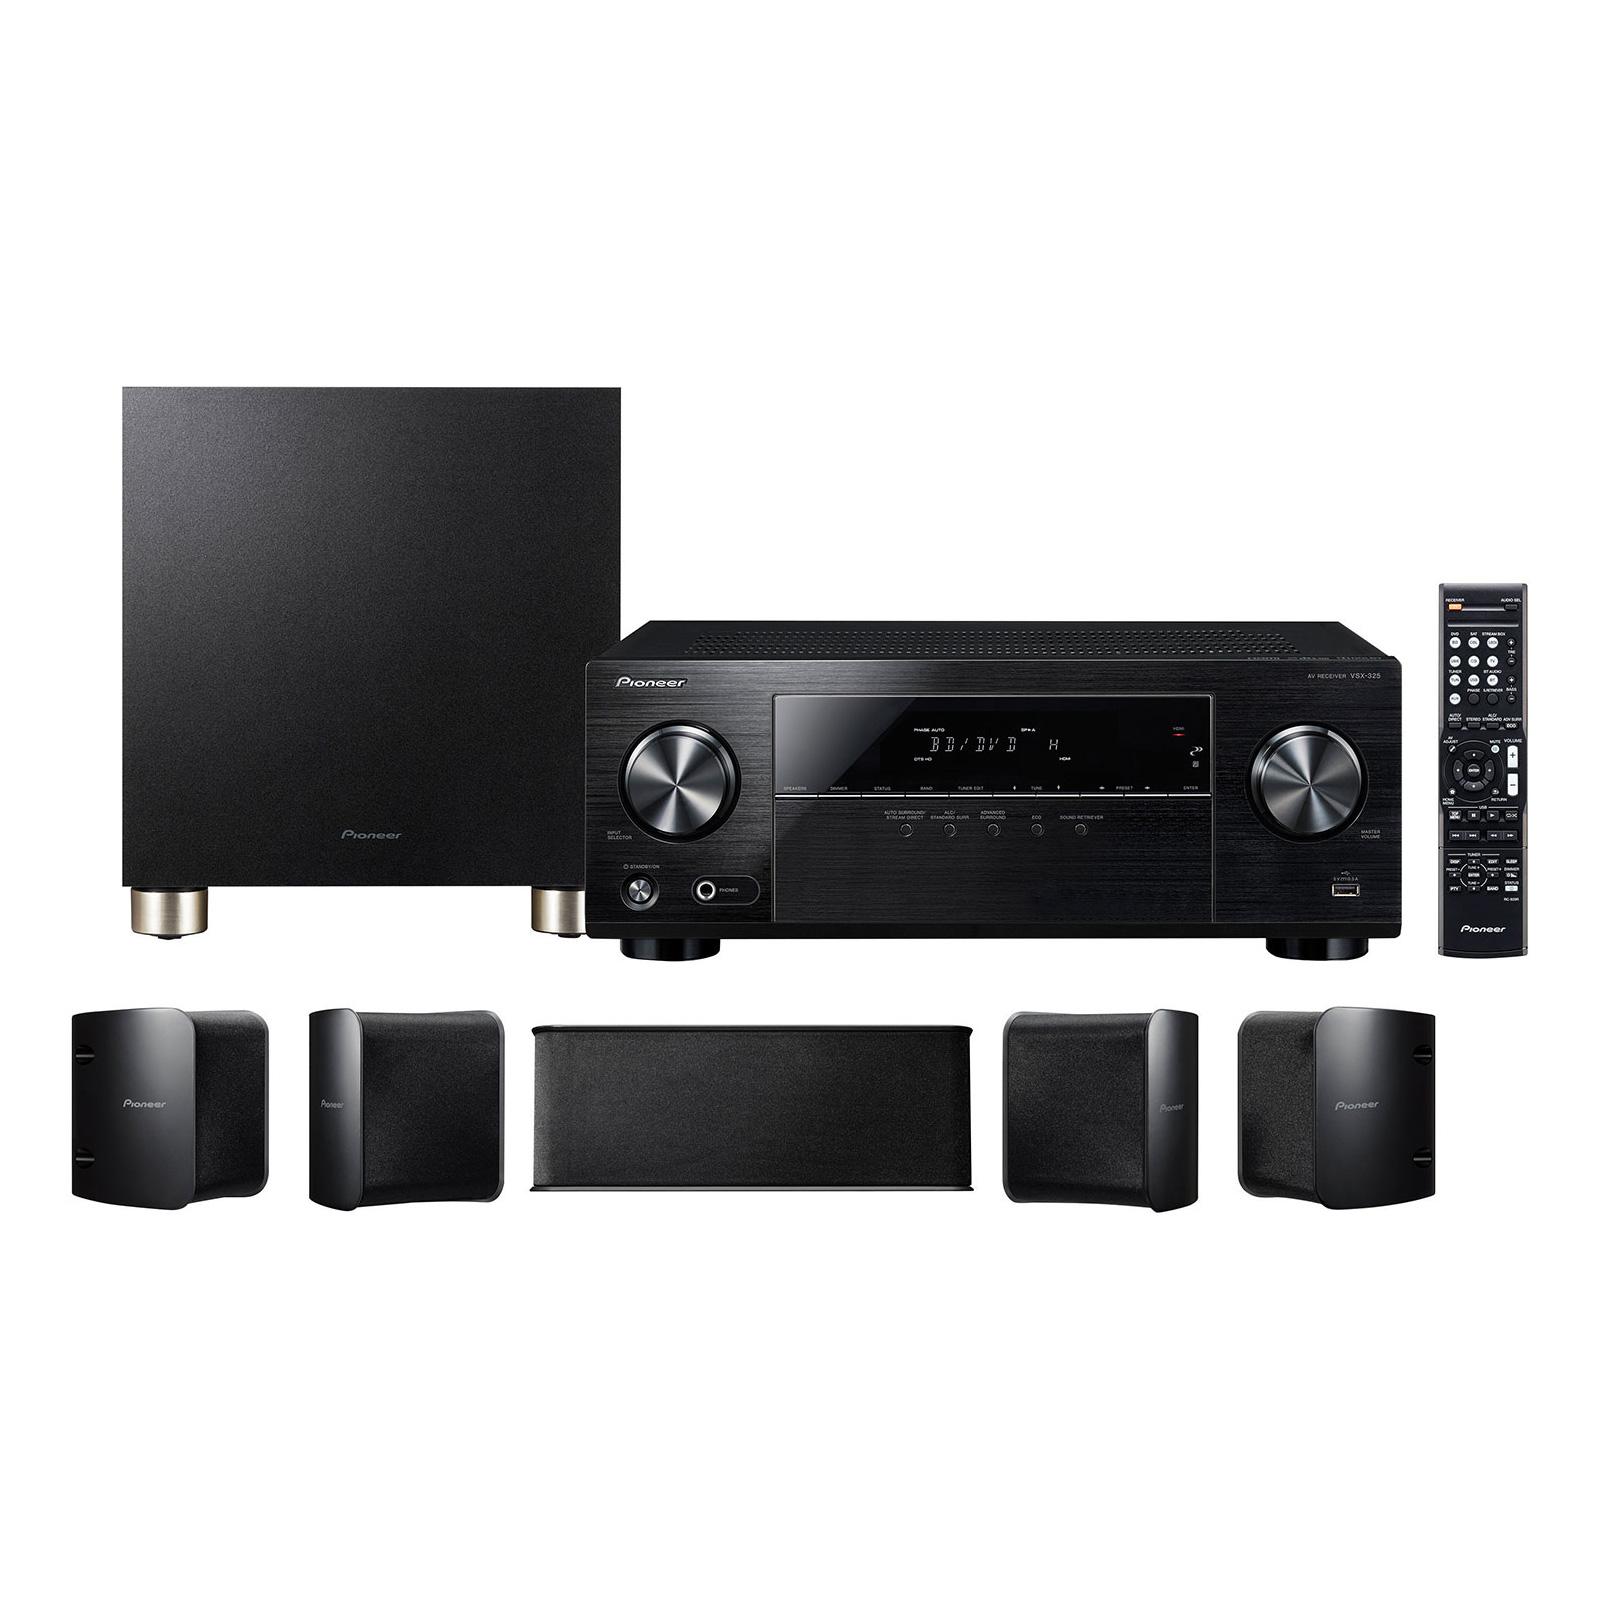 Ensemble home cinéma Pioneer HTP-074 Ensemble Home Cinema 5.1 600W 4K Ultra HD 3D HDMI/Bluietooth + Kit enceintes 5.1 avec caisson de basses